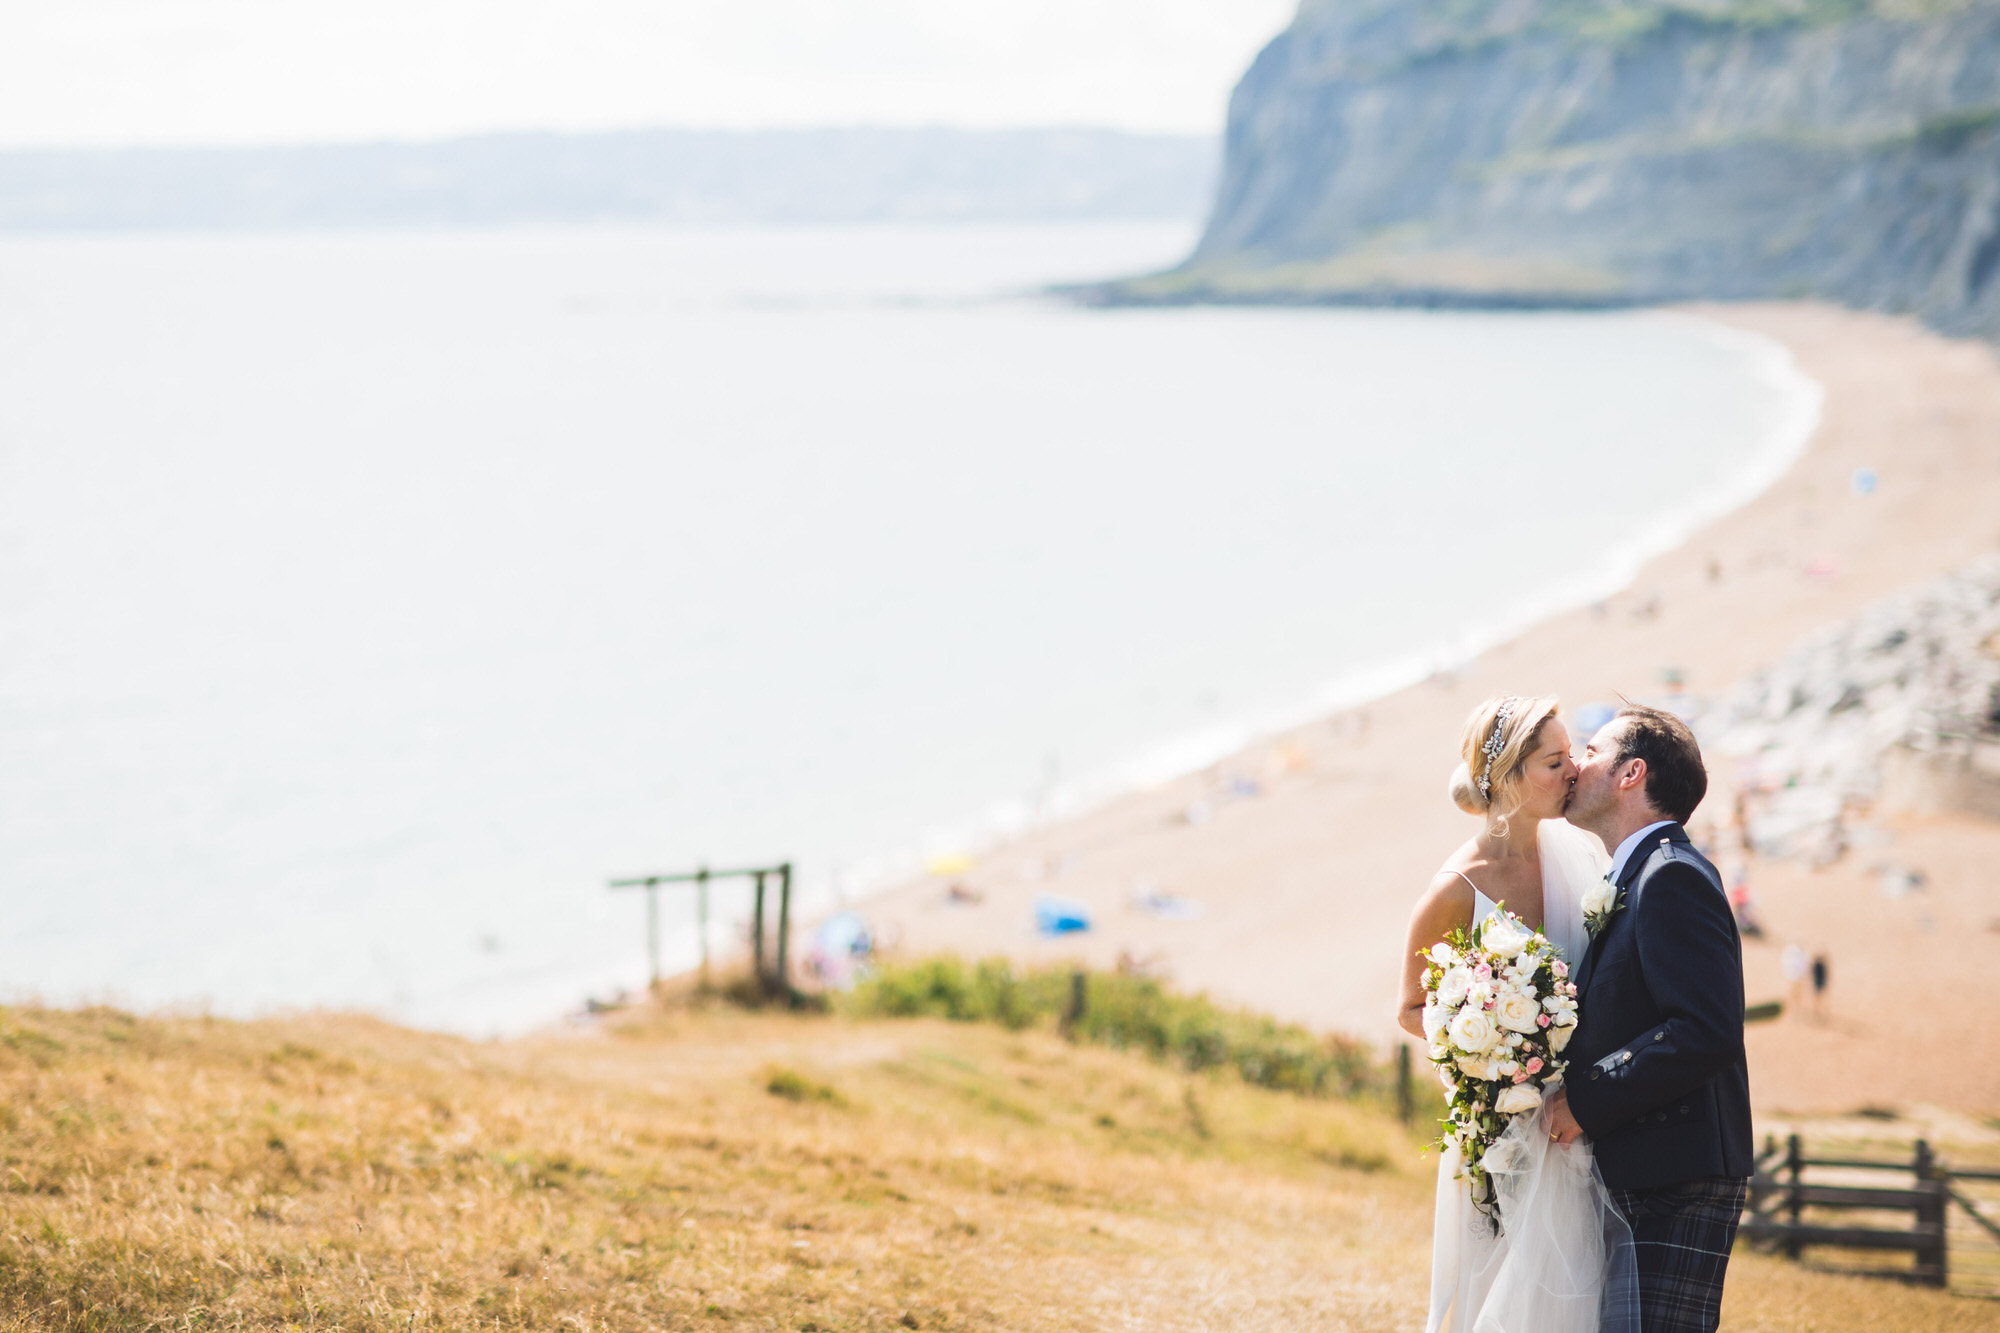 Dorset marquee wedding by the sea simon biffen photography 26